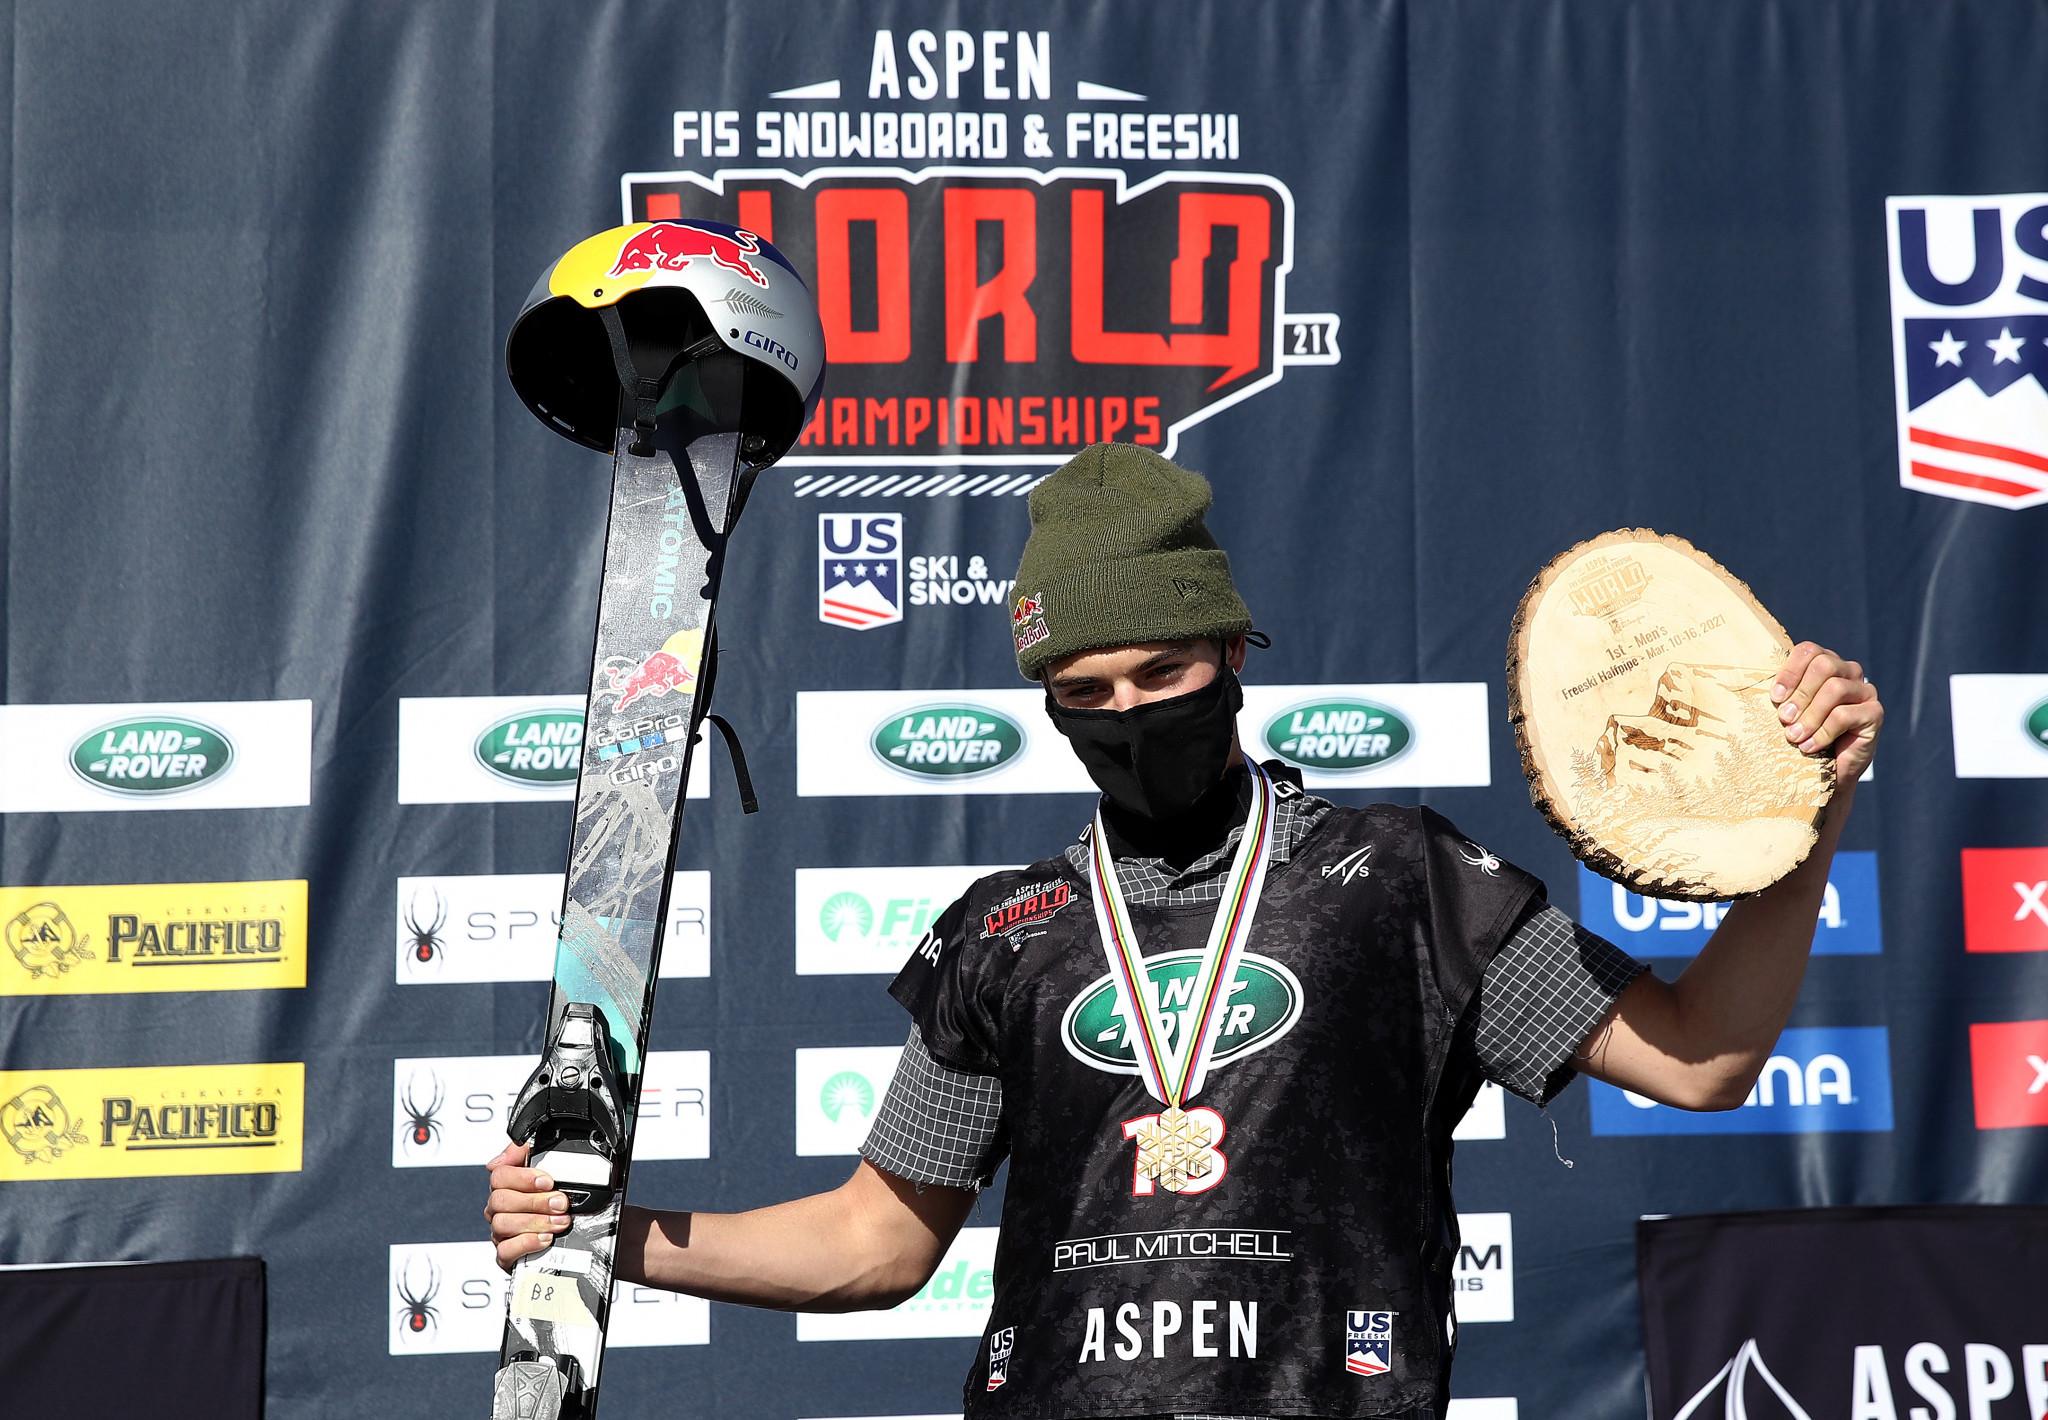 Teenagers Gu and Porteous win ski halfpipe world titles in Aspen